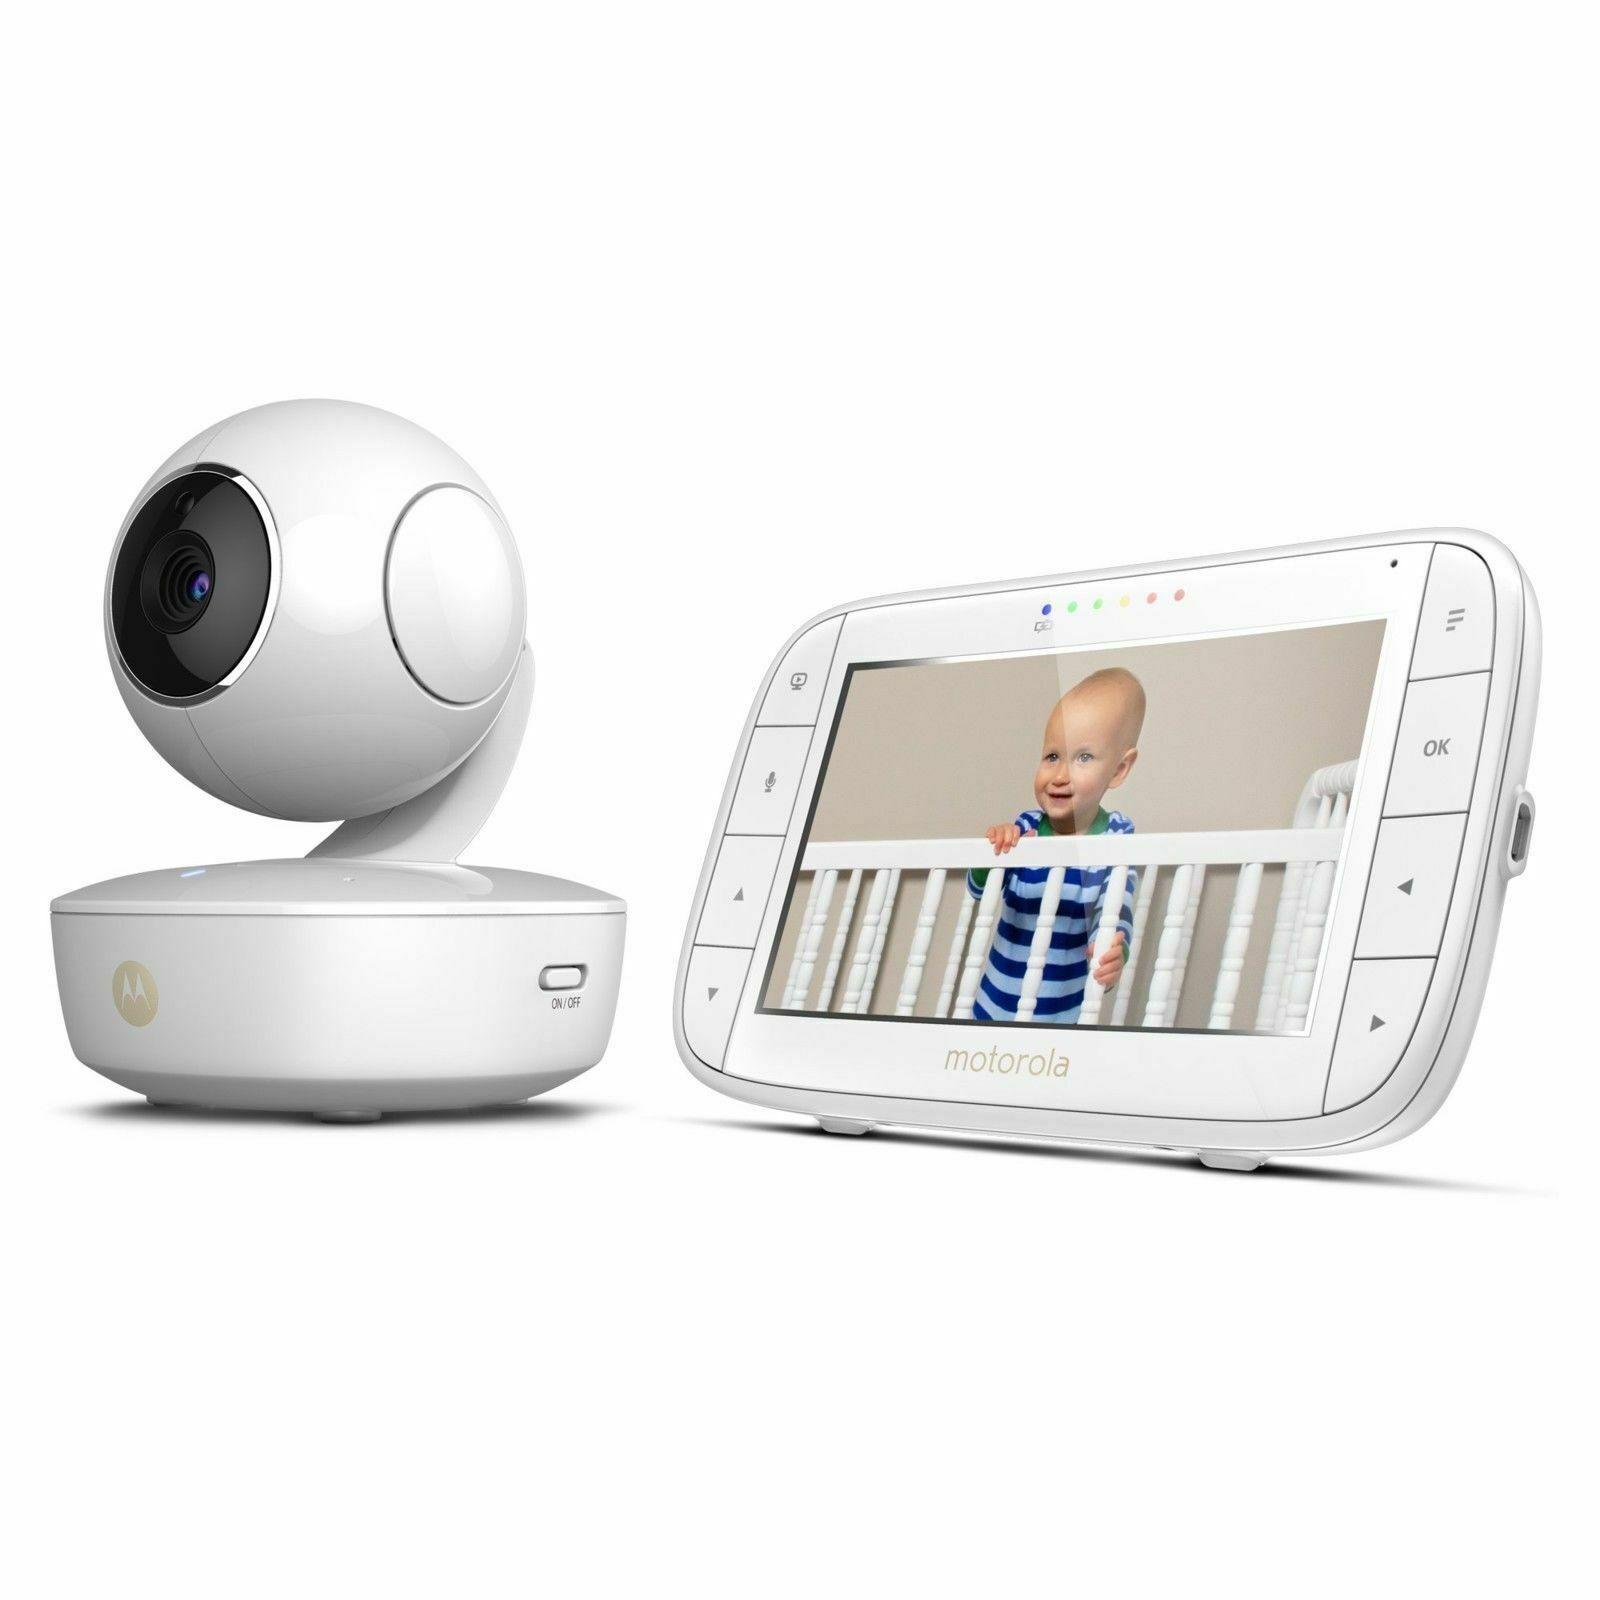 "Motorola MBP36XL Video Baby Monitor Pan/Tilt/Zoom 5"" Color"